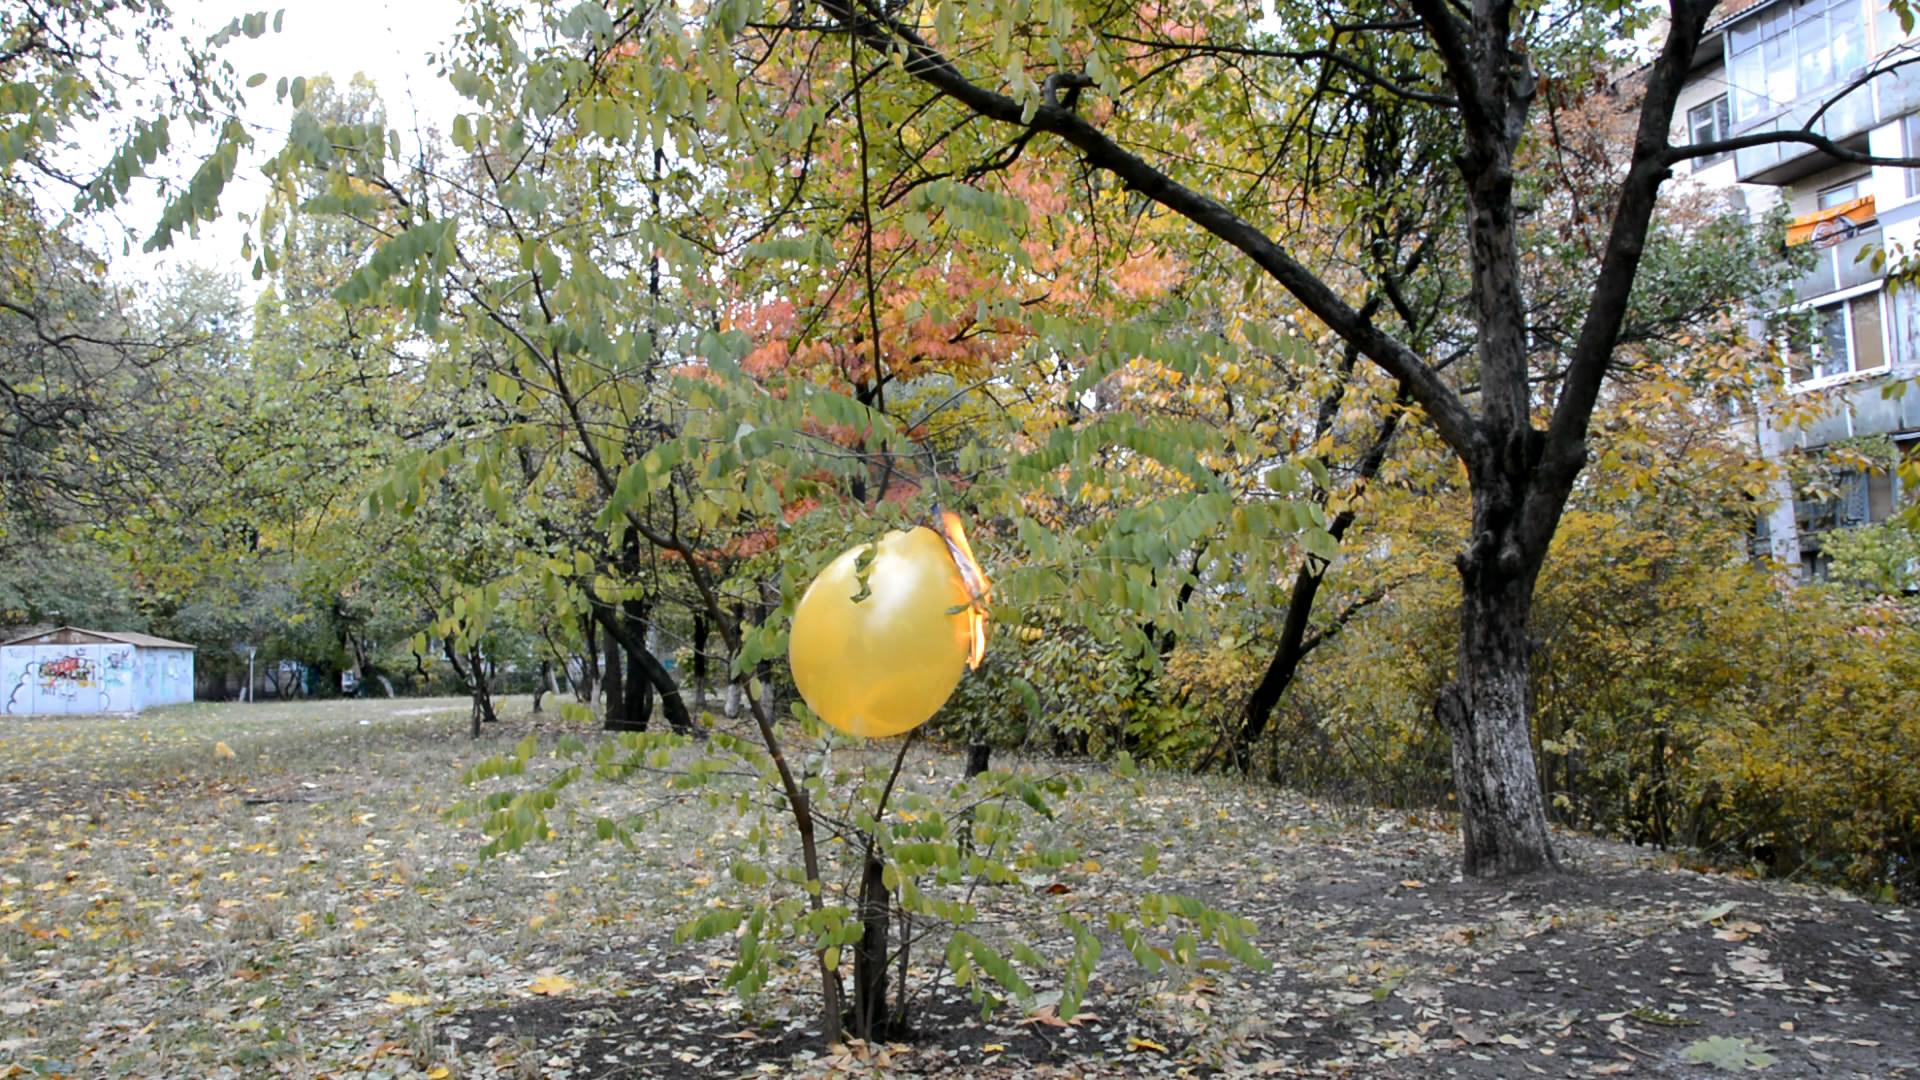 Смесь ацетилен-воздух (взрыв воздушного шарика). Mixture of Acetylene and Air (Explosion of Toy Balloon)